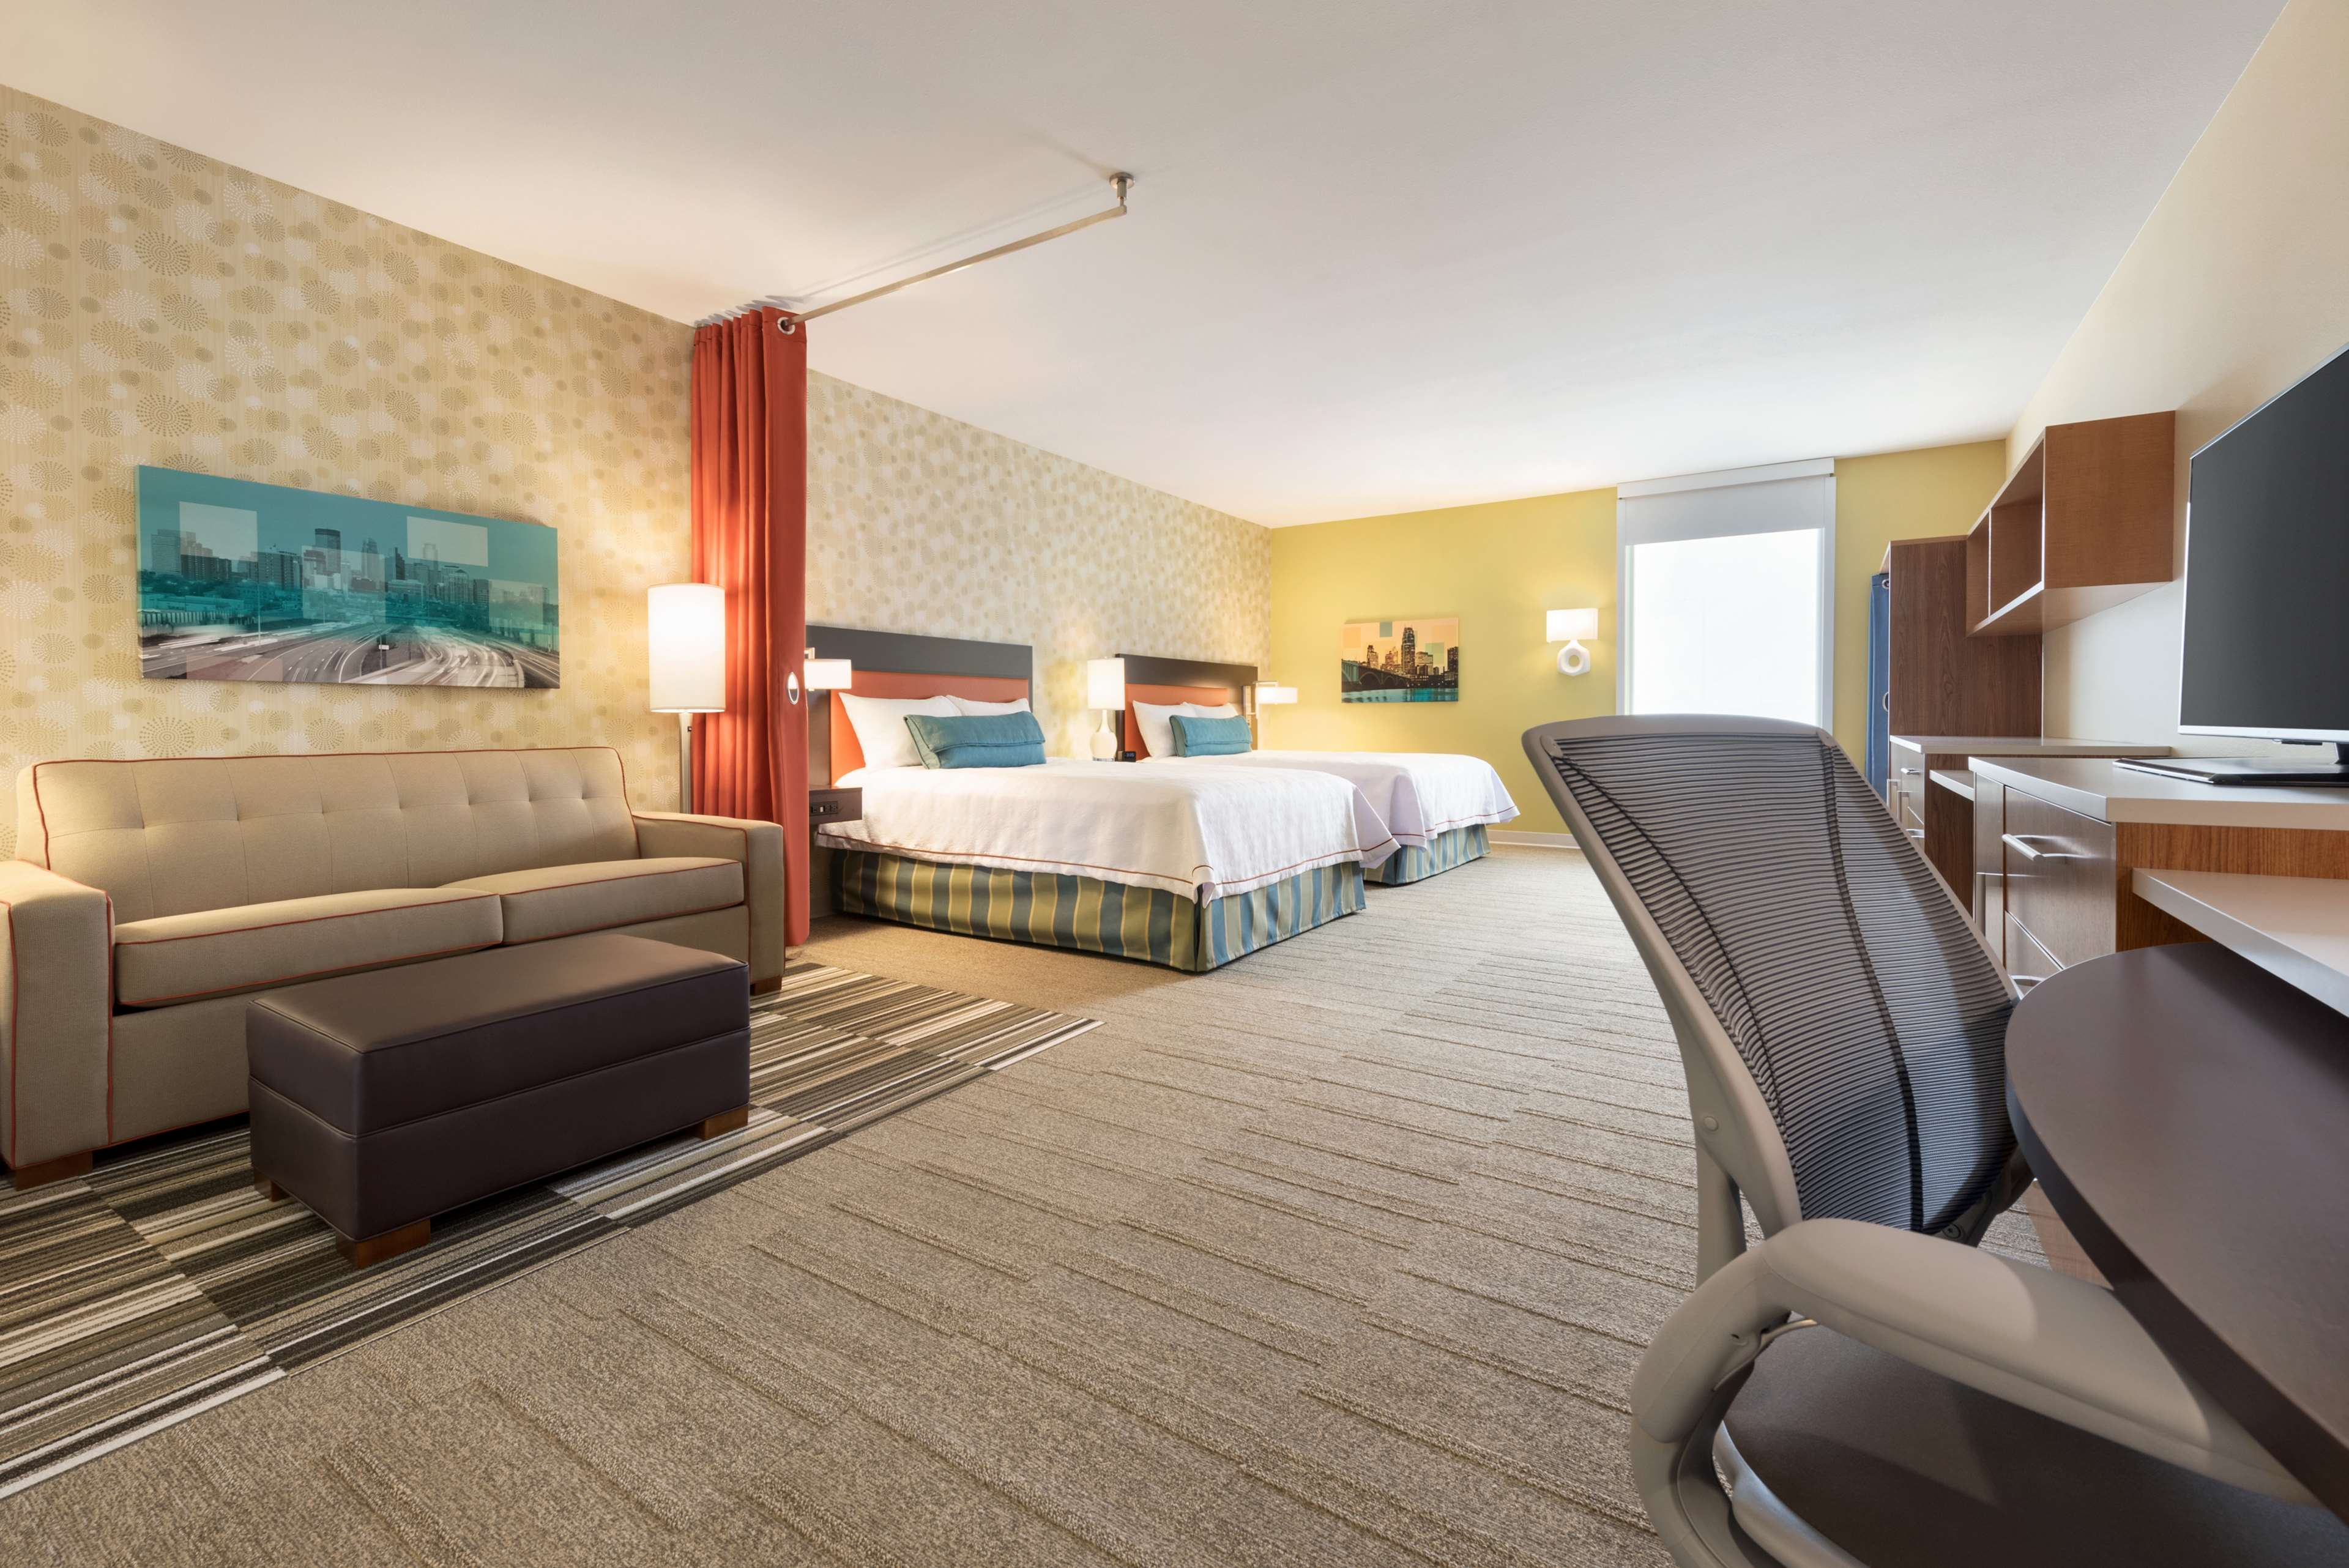 Home2 Suites by Hilton Roseville Minneapolis image 2